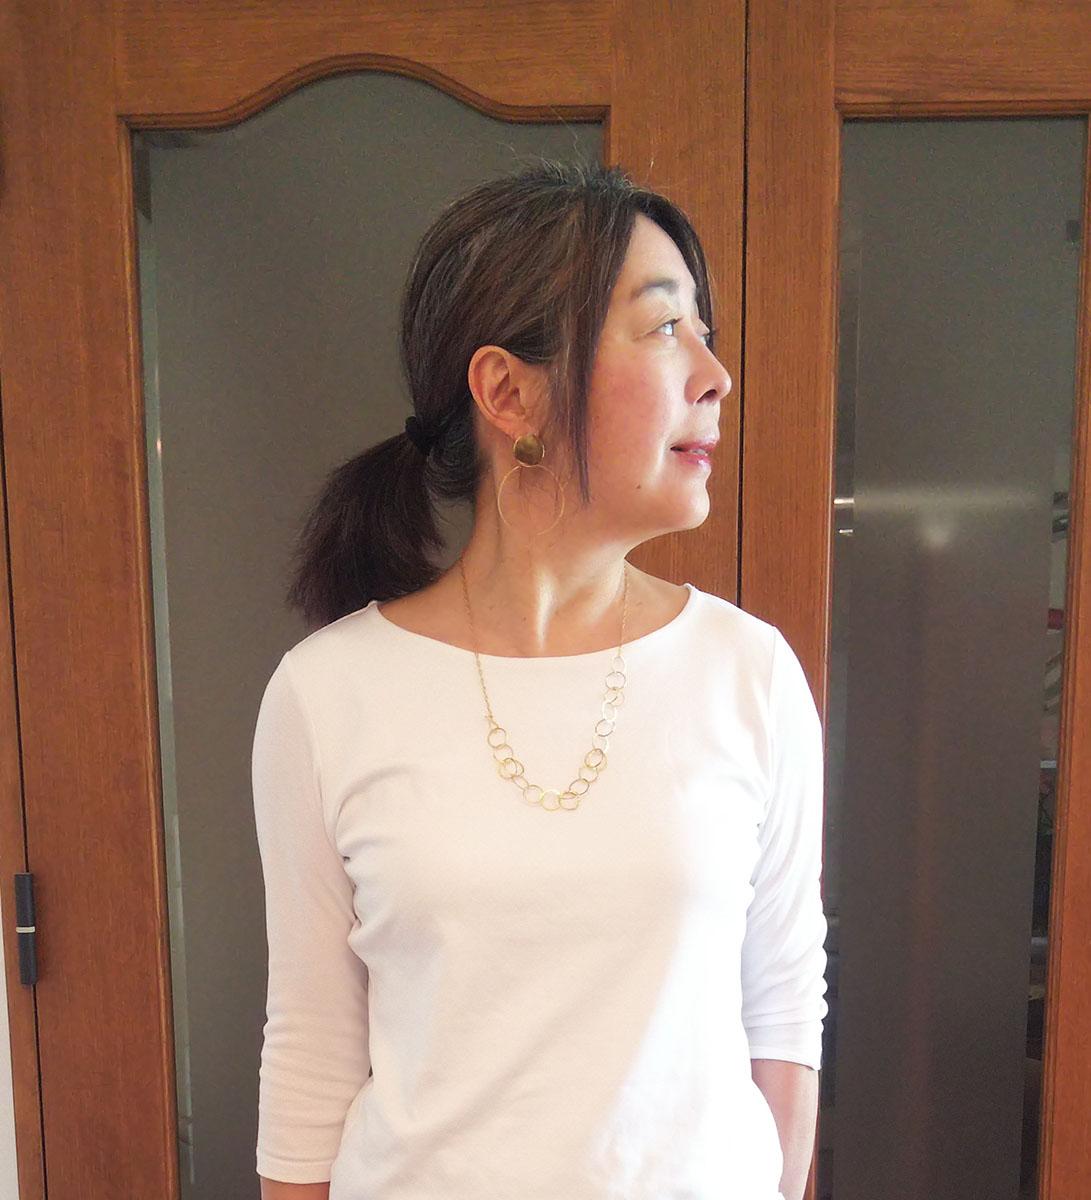 Mirisa/Link Change ネックレス